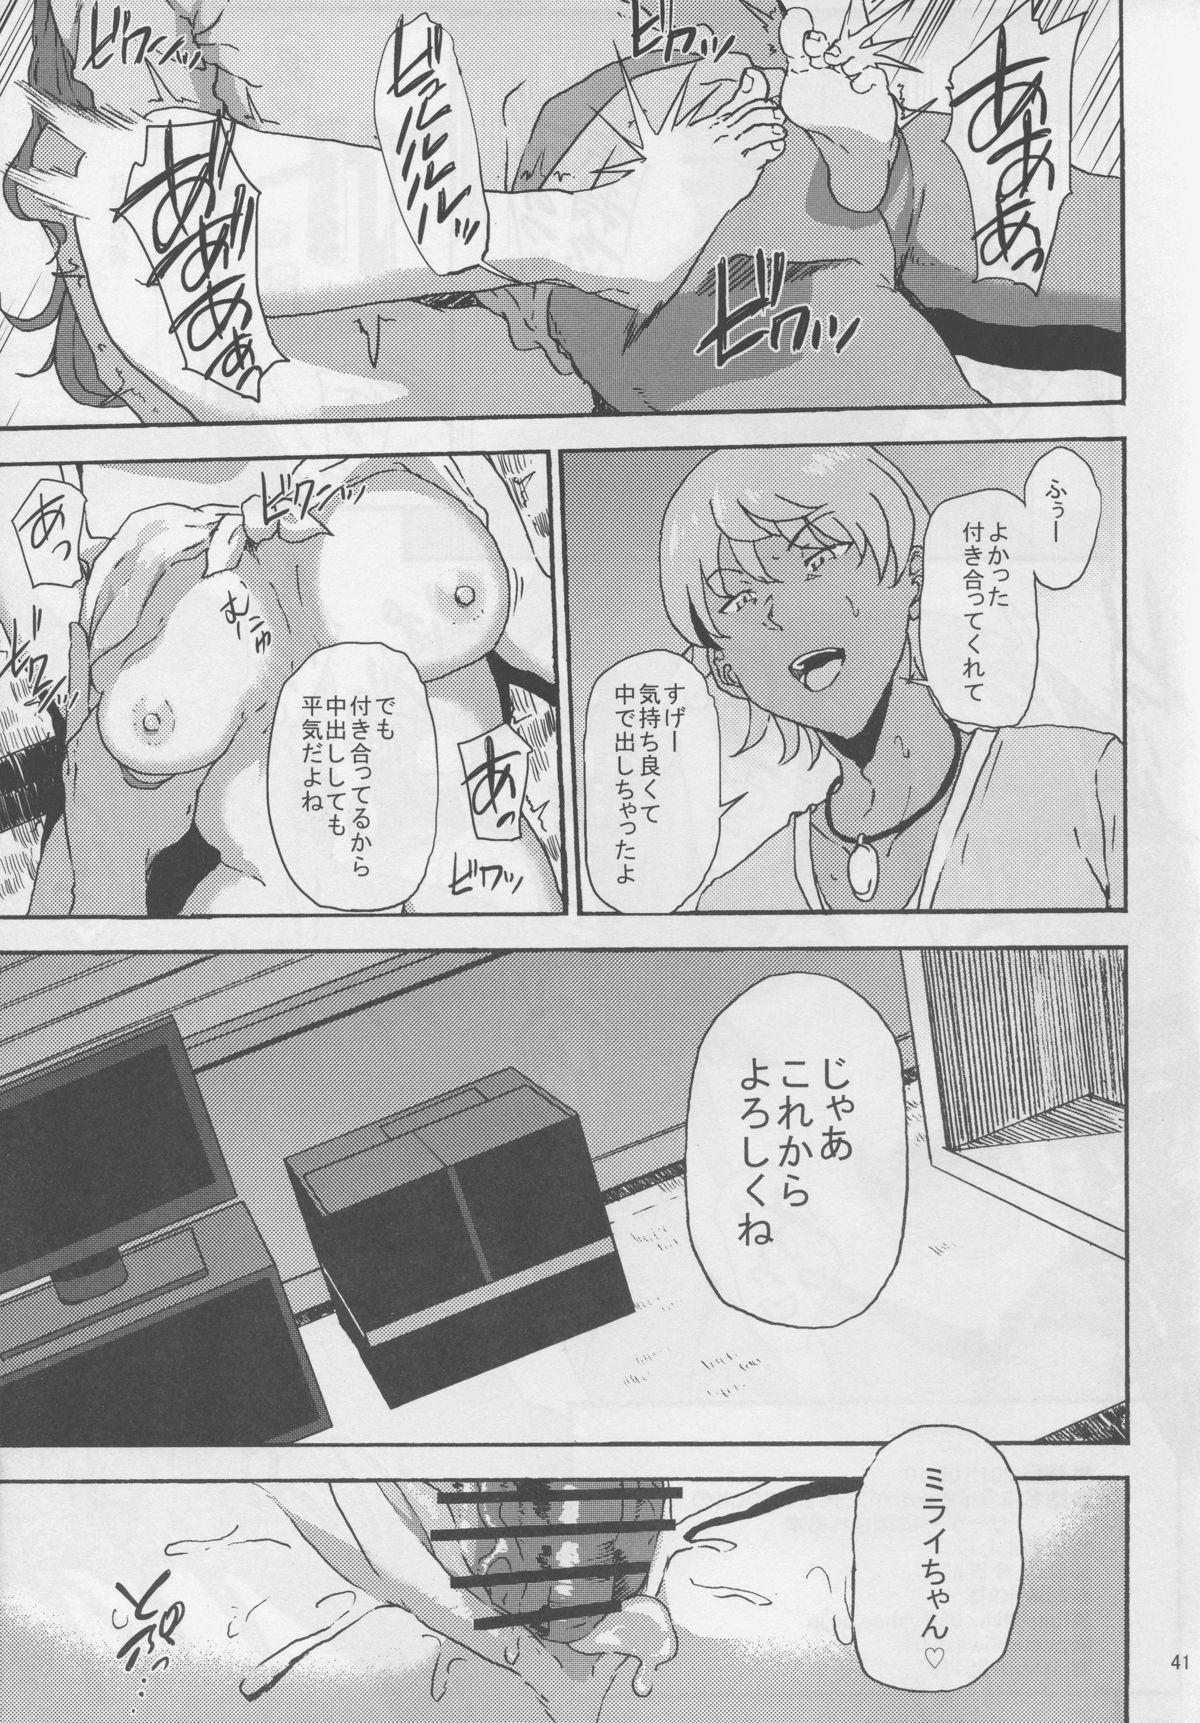 Mirai-chan ga Sandaime SGOCK no Leader ni Damasare Yarechau Hon 40